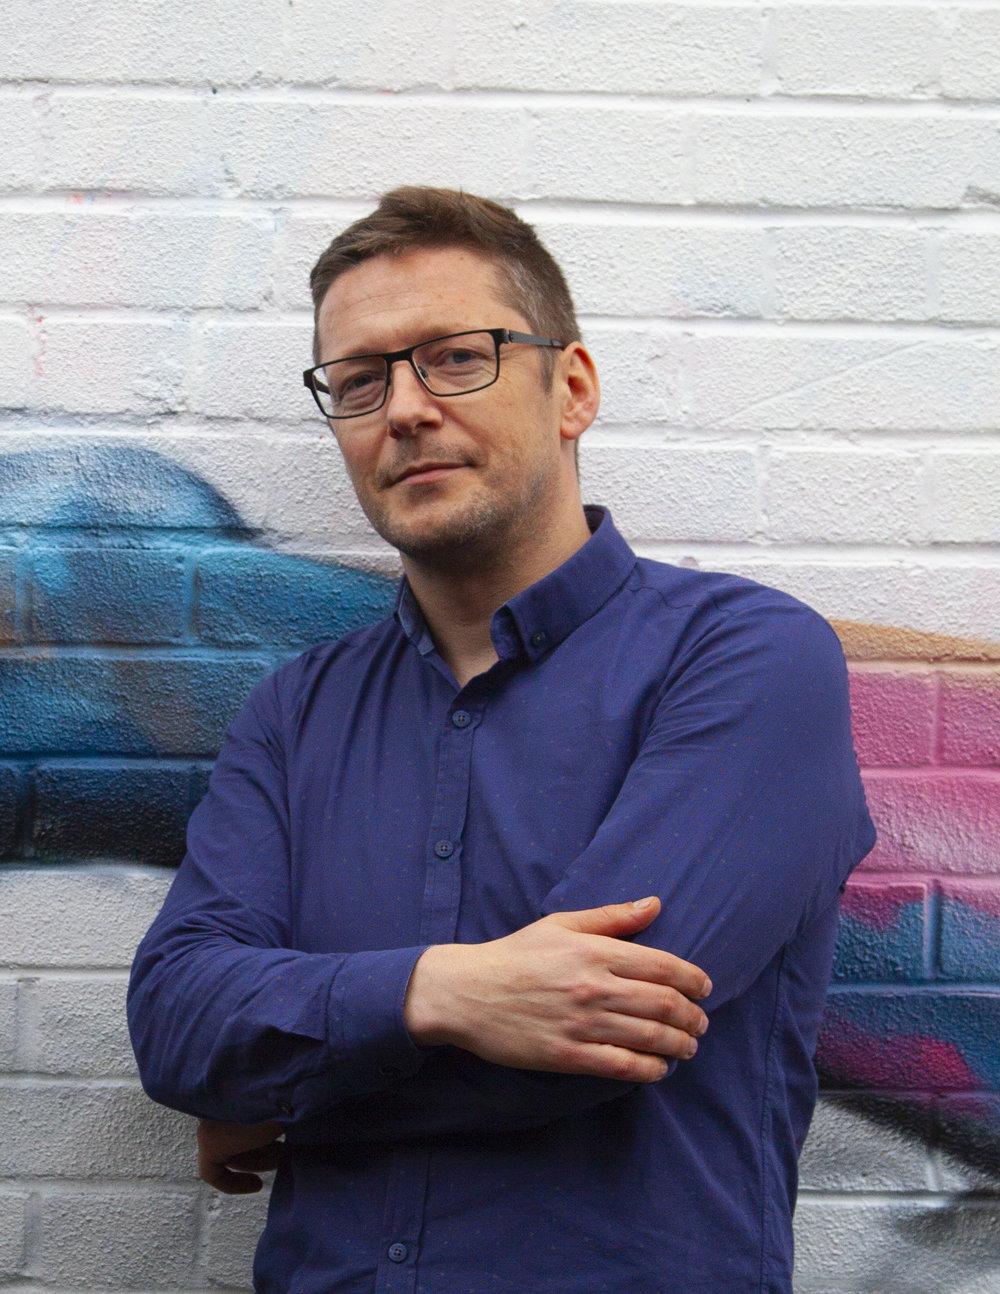 Ben Rigby, Haberdashery's Creative Director. Courtesy of Haberdashery.